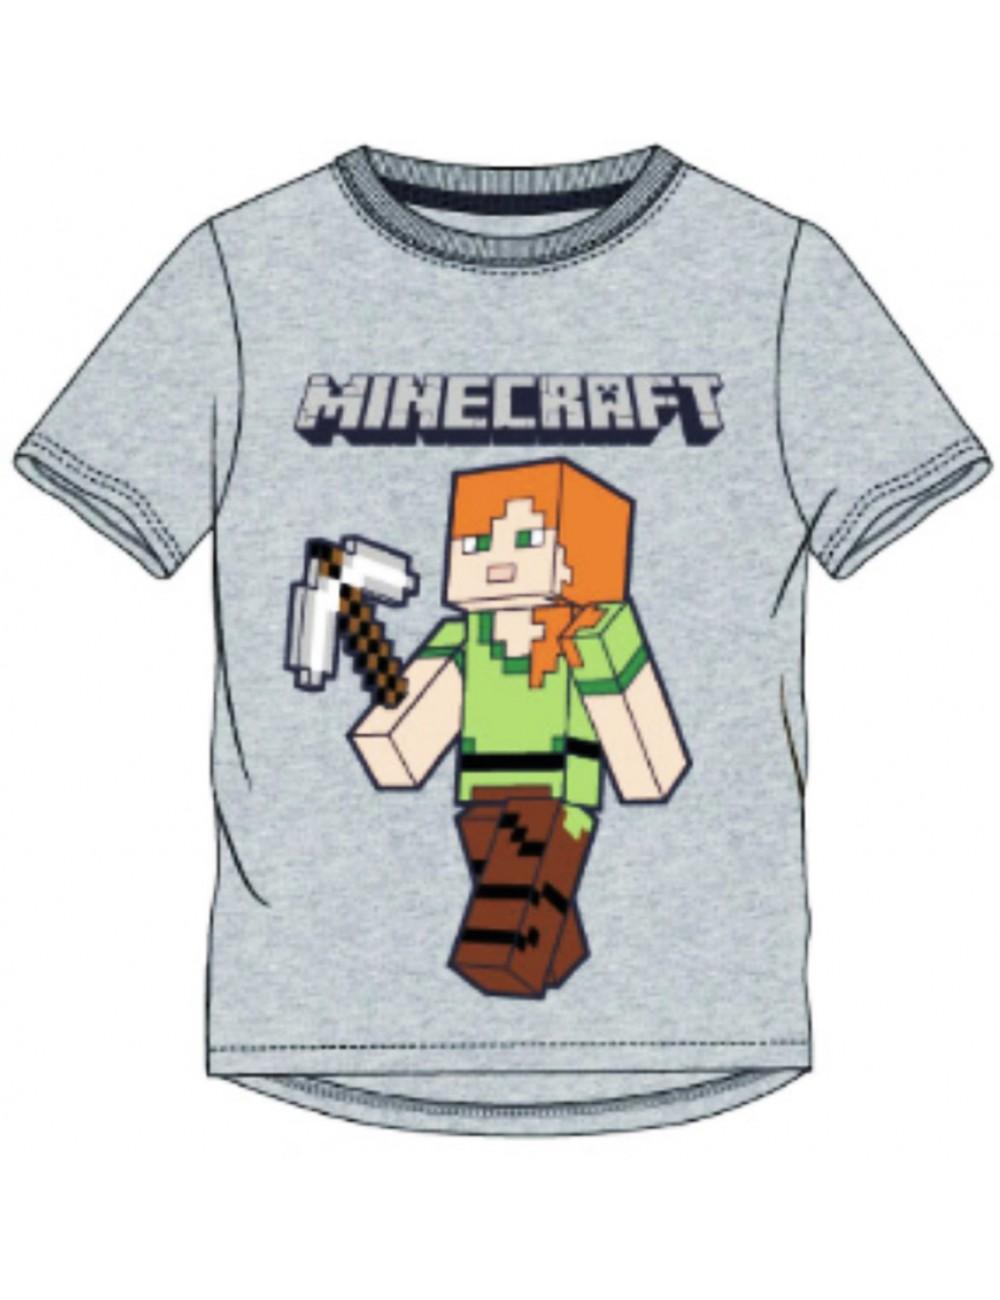 Tricou Minecraft Steve, gri, copii 6-12 ani